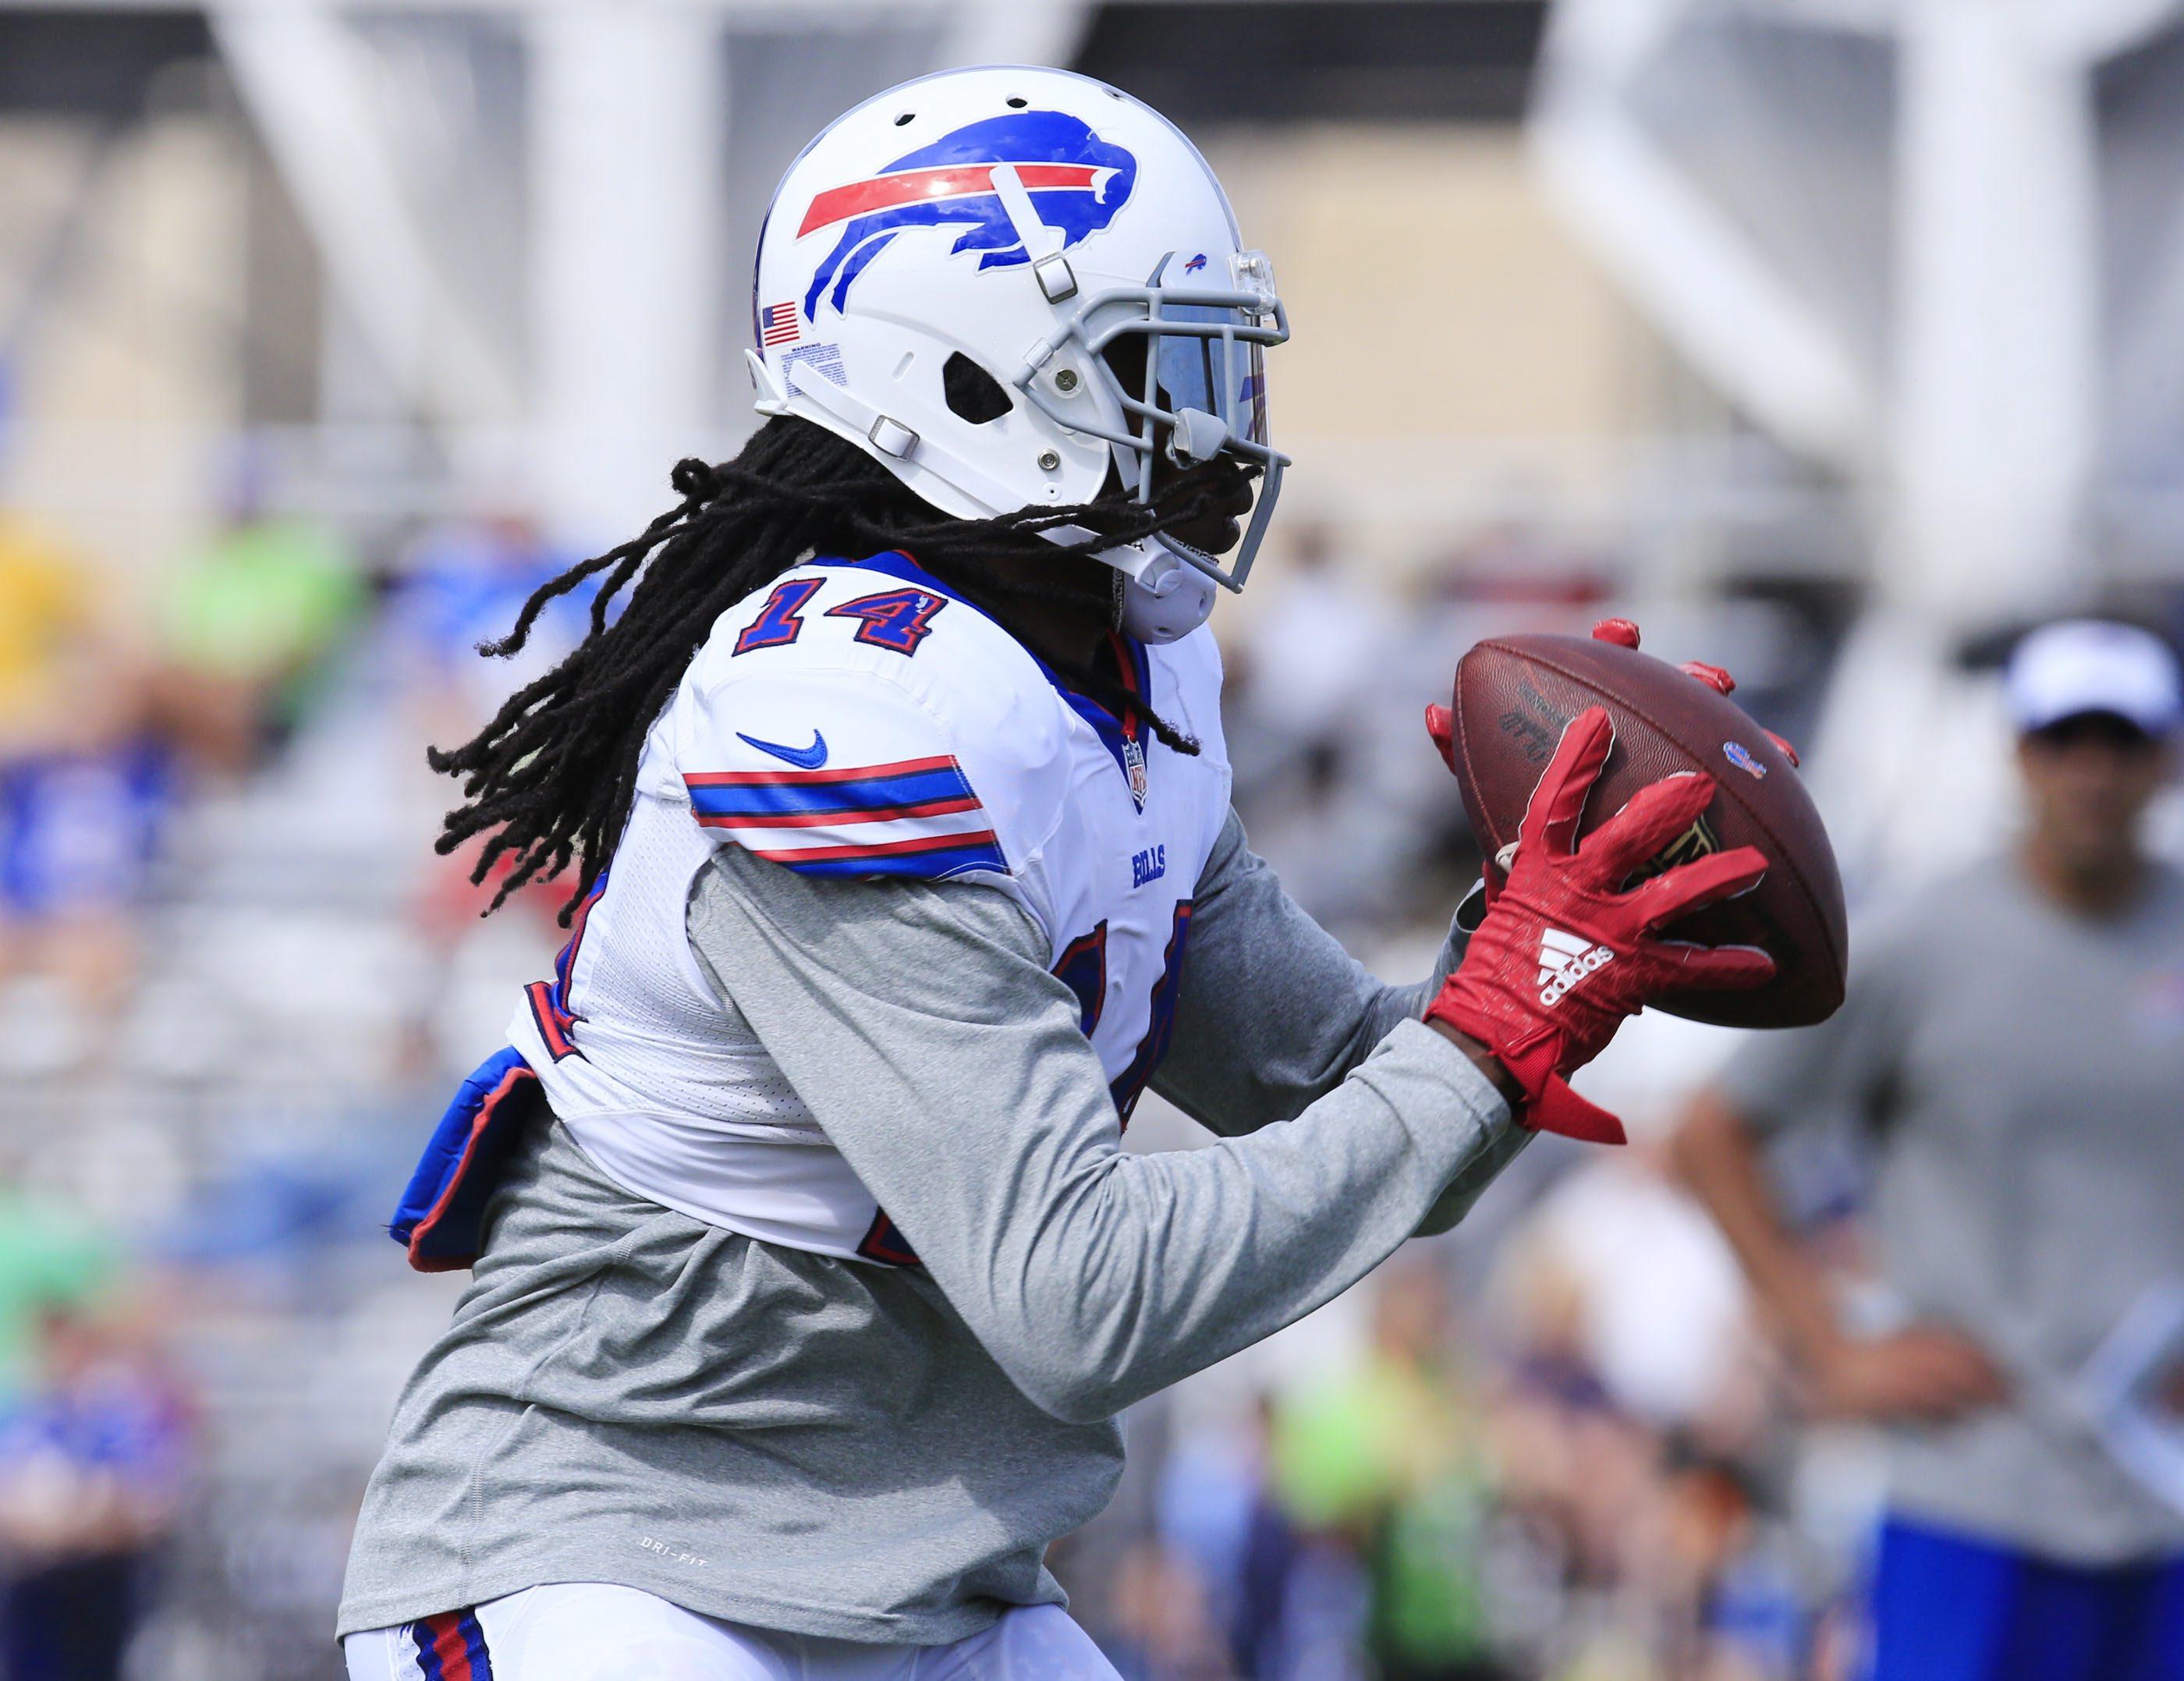 Bills receiver Sammy Watkins had an eventful Wednesday thanks to social media. (James P. McCoy/Buffalo News)